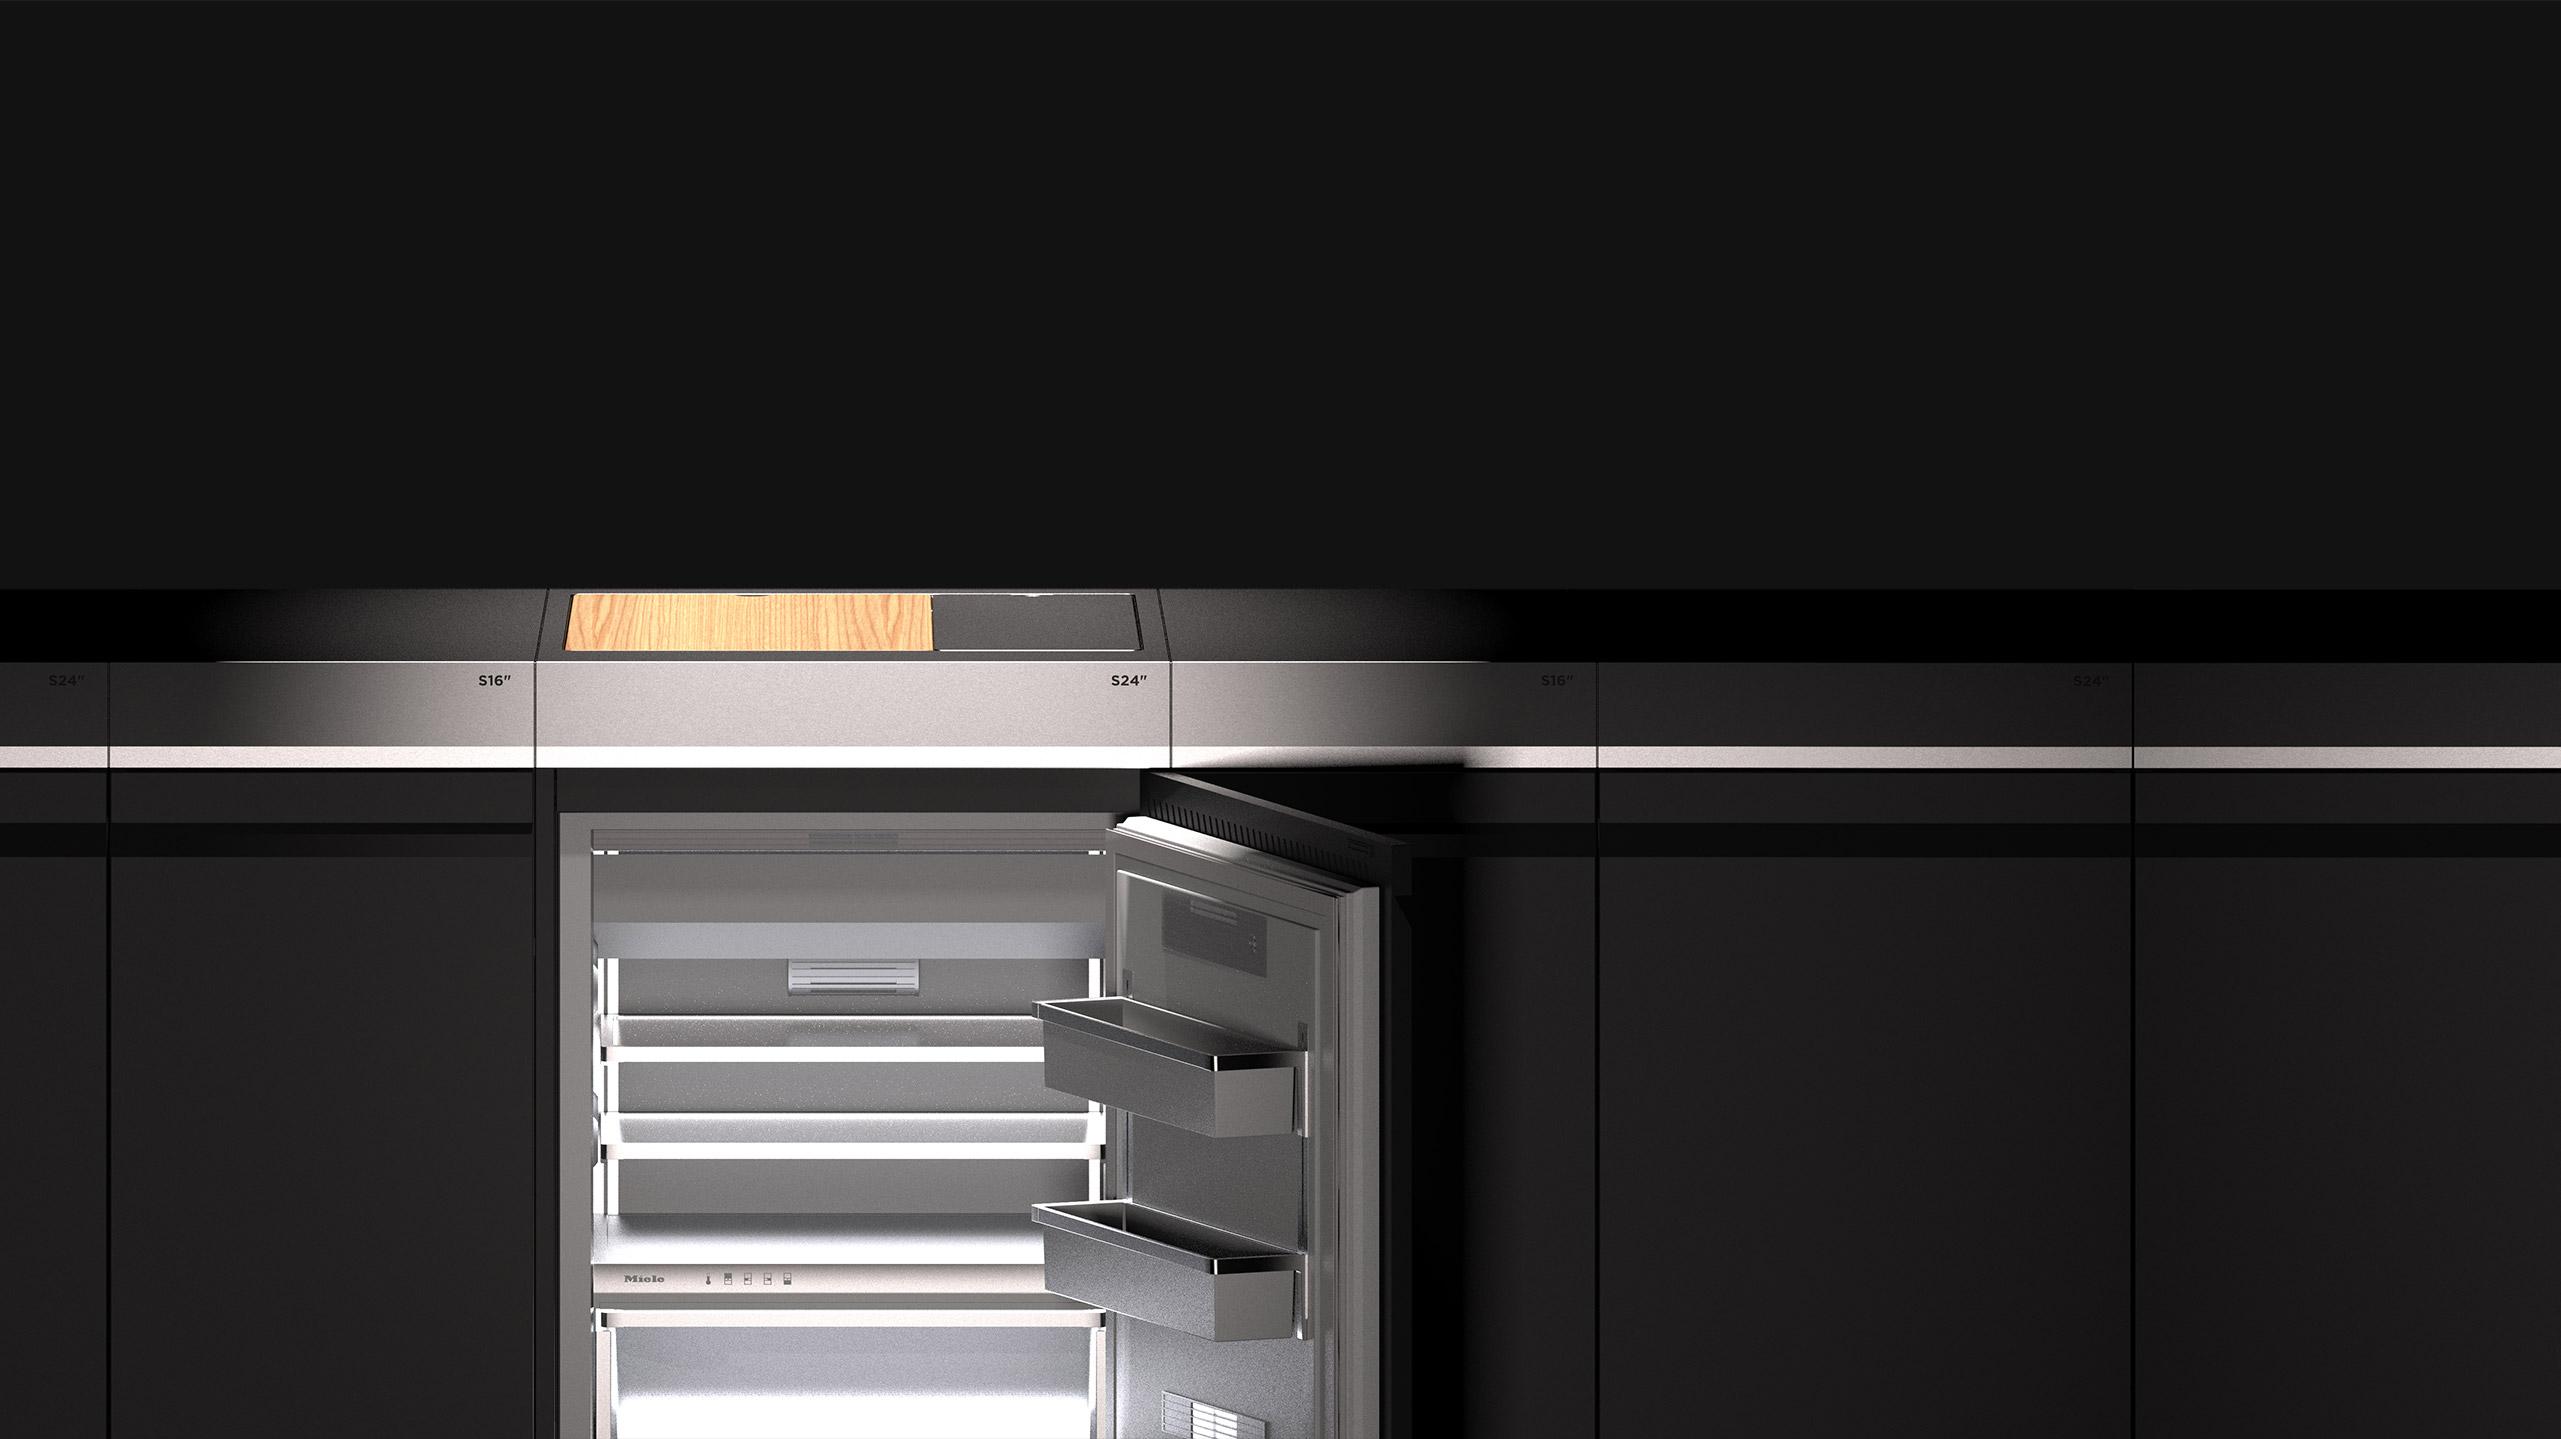 S24_fridge